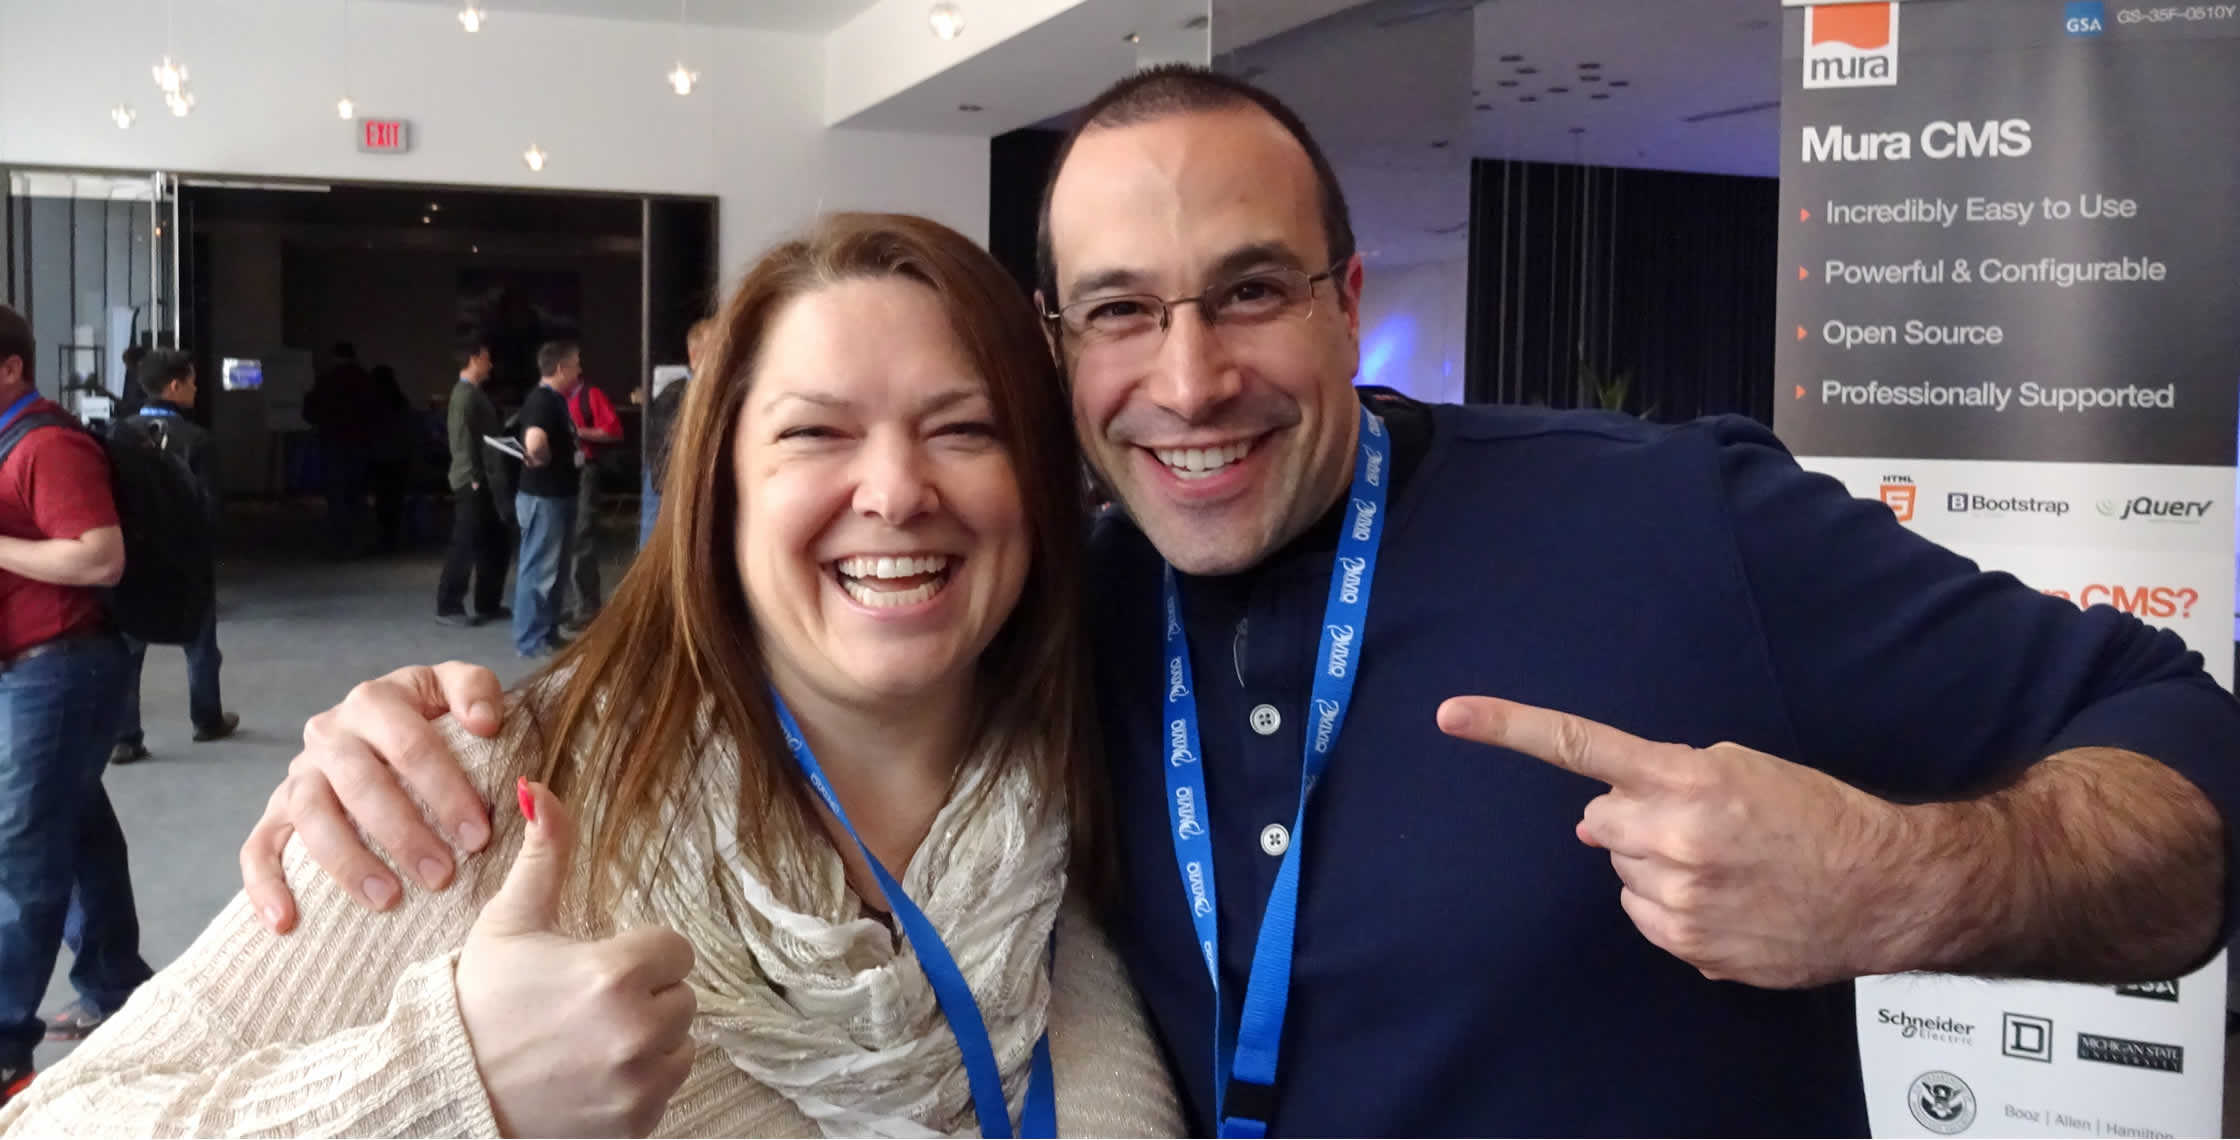 Ben Nadel at cf.Objective() 2014 (Bloomington, MN) with: Sharon DiOrio